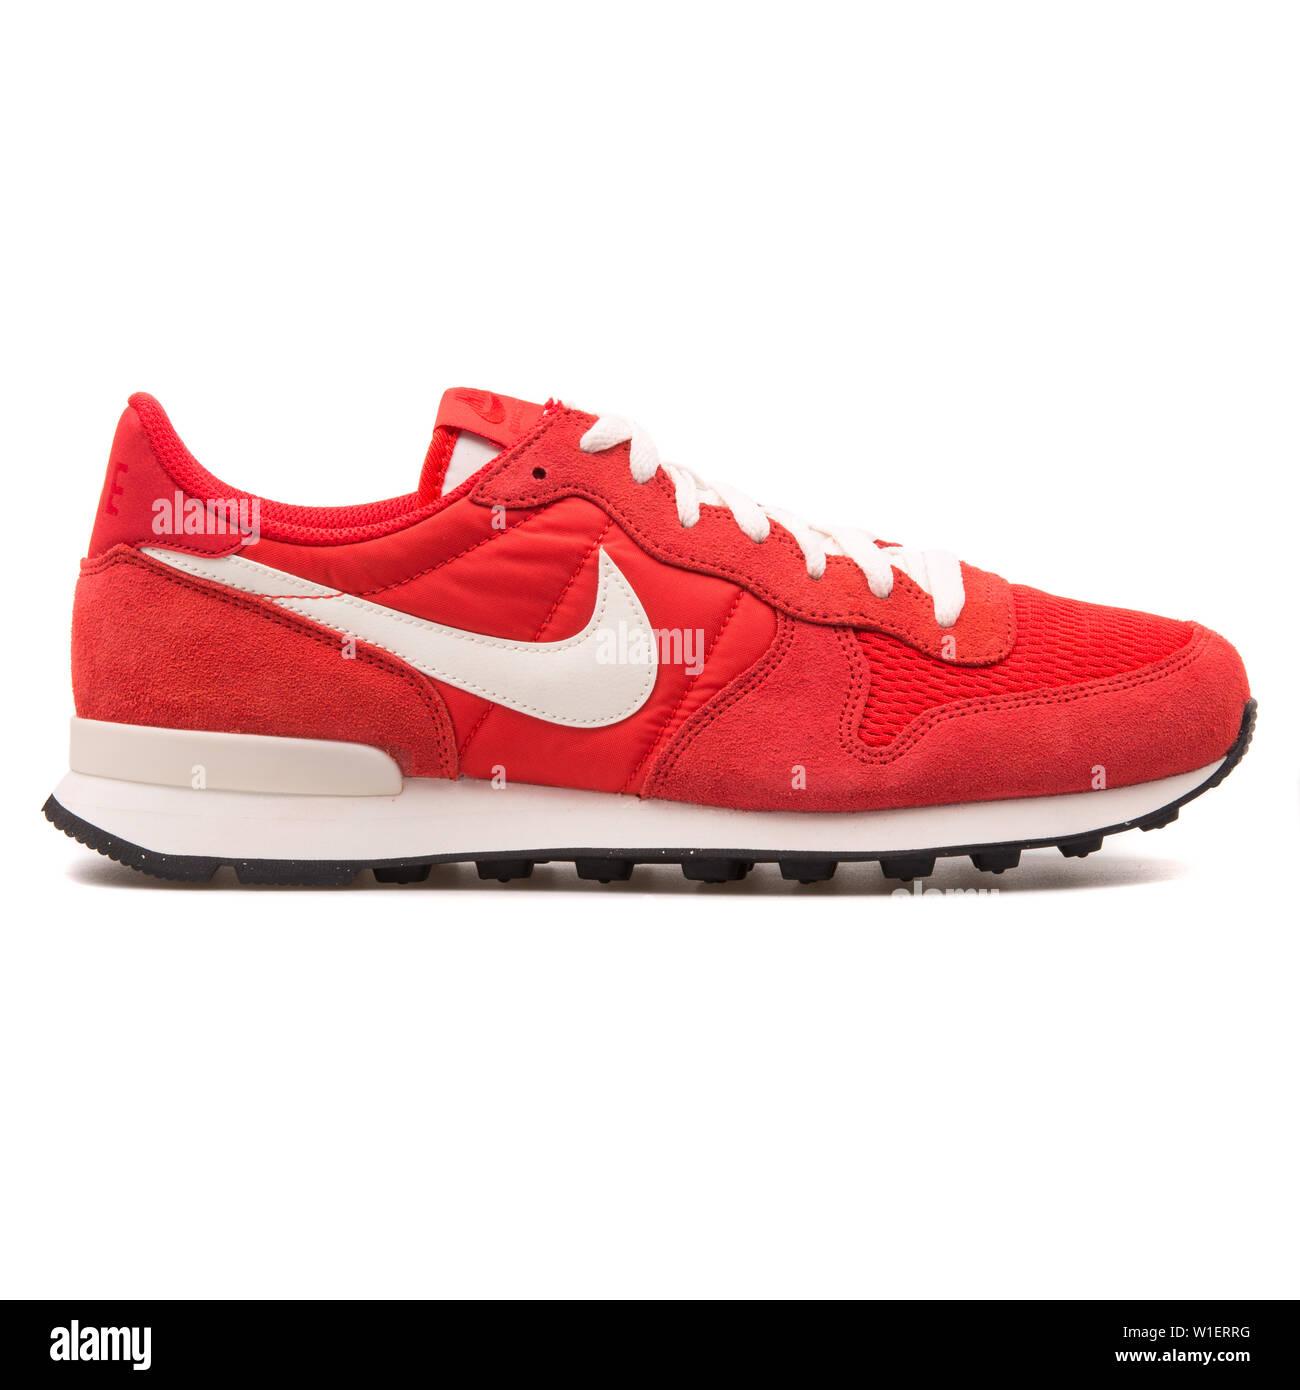 Nike Internationalist red and white